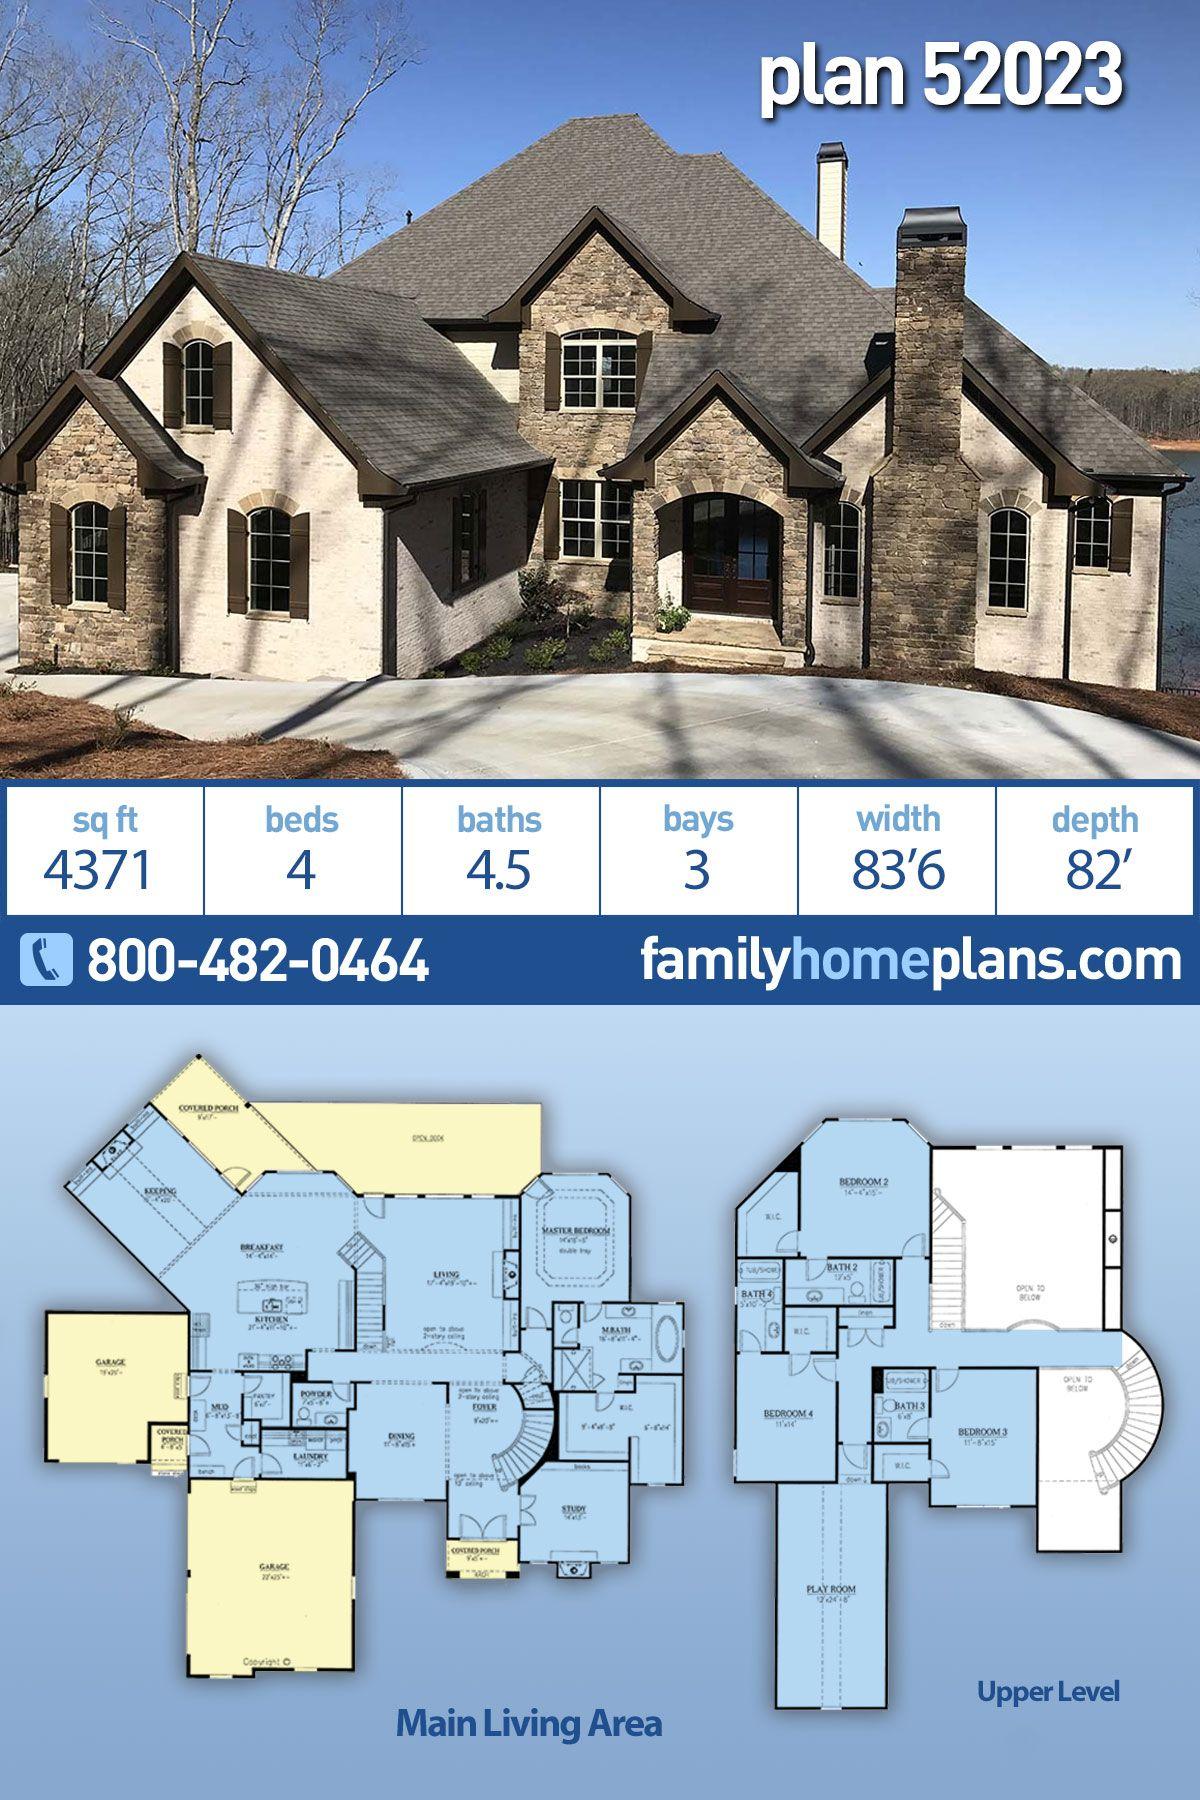 European Style House Plan 52023 With 4 Bed 5 Bath 3 Car Garage House Plans Sims House Plans House Plans Farmhouse